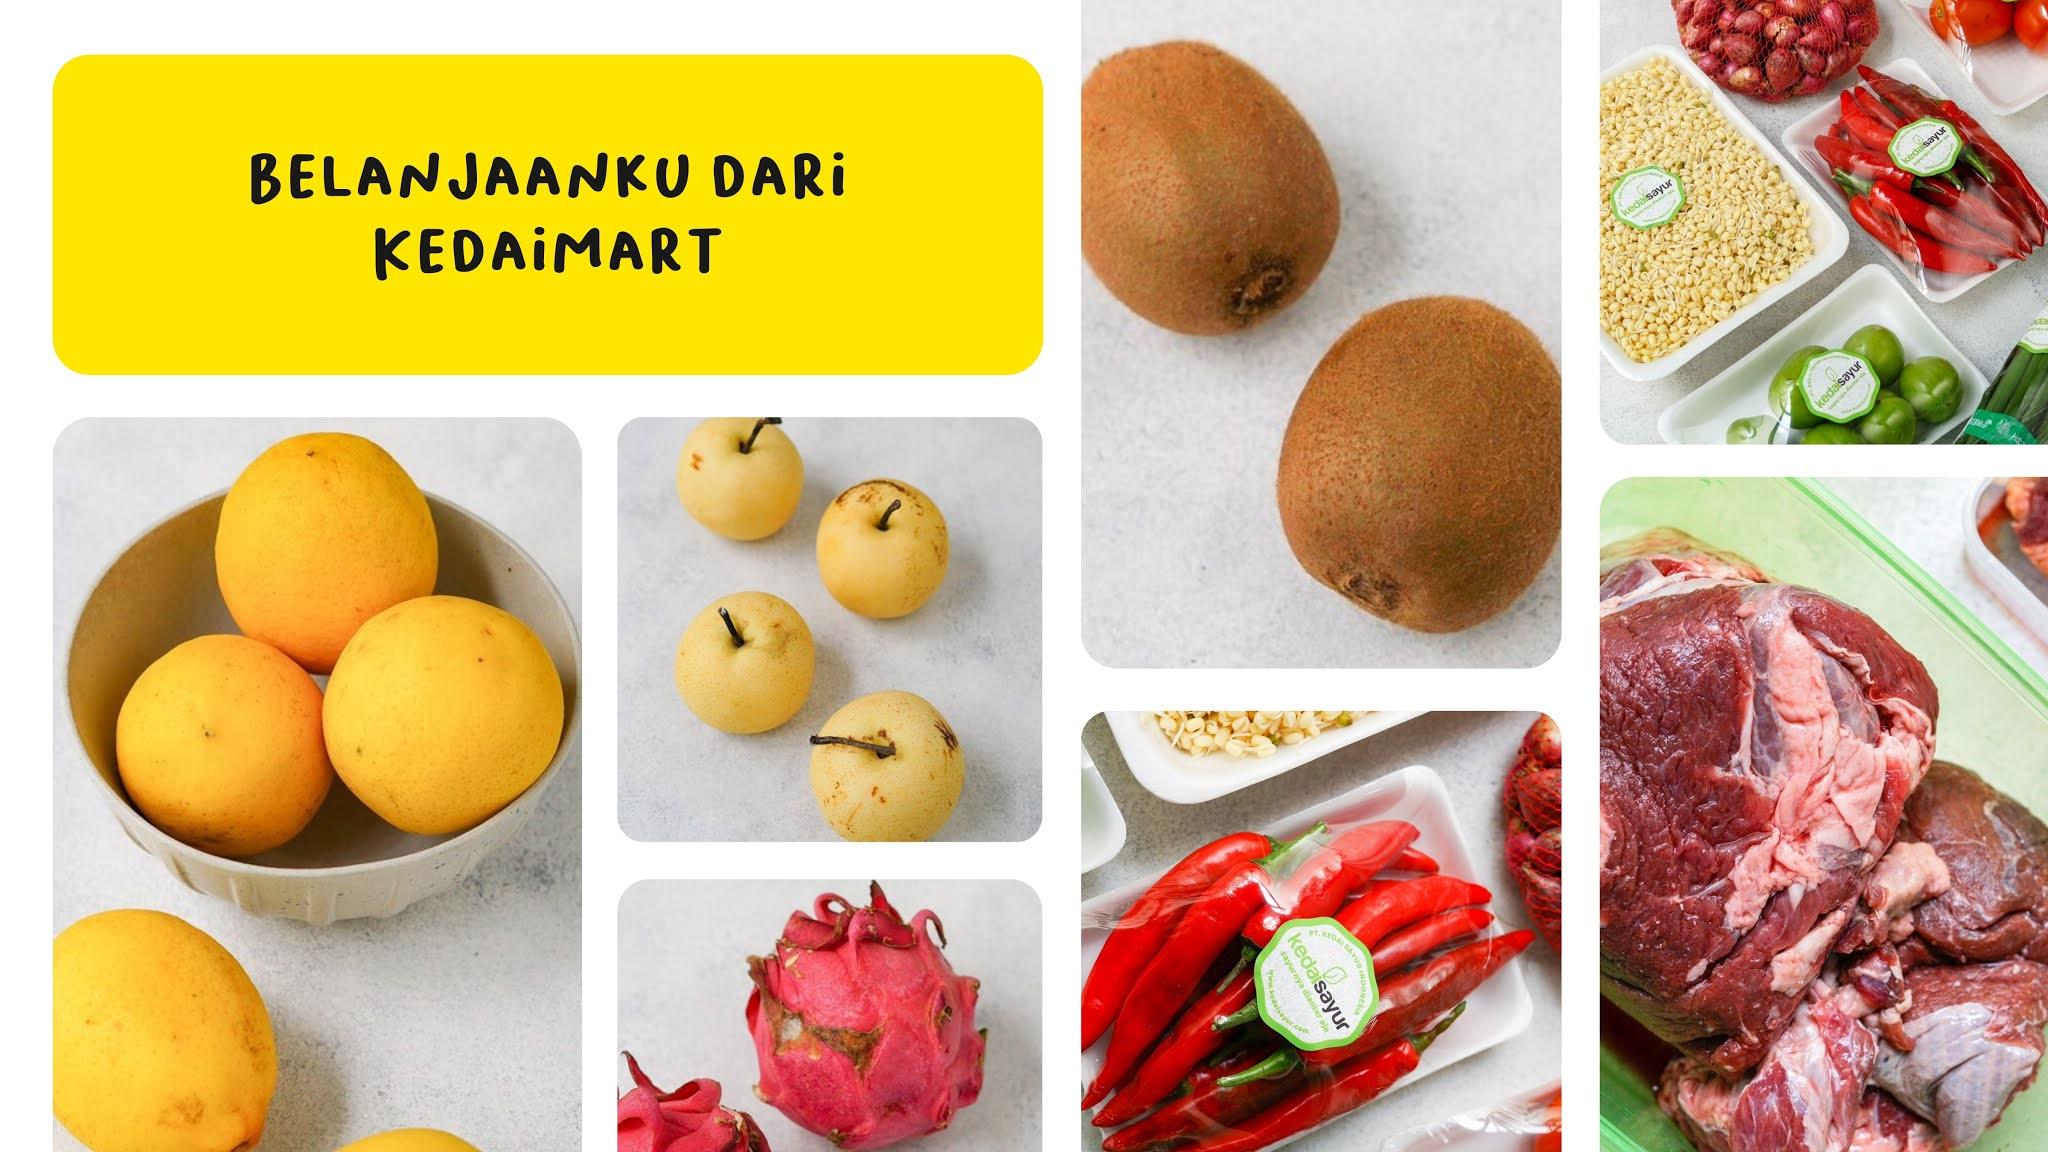 belanja sayur online di KedaiMart